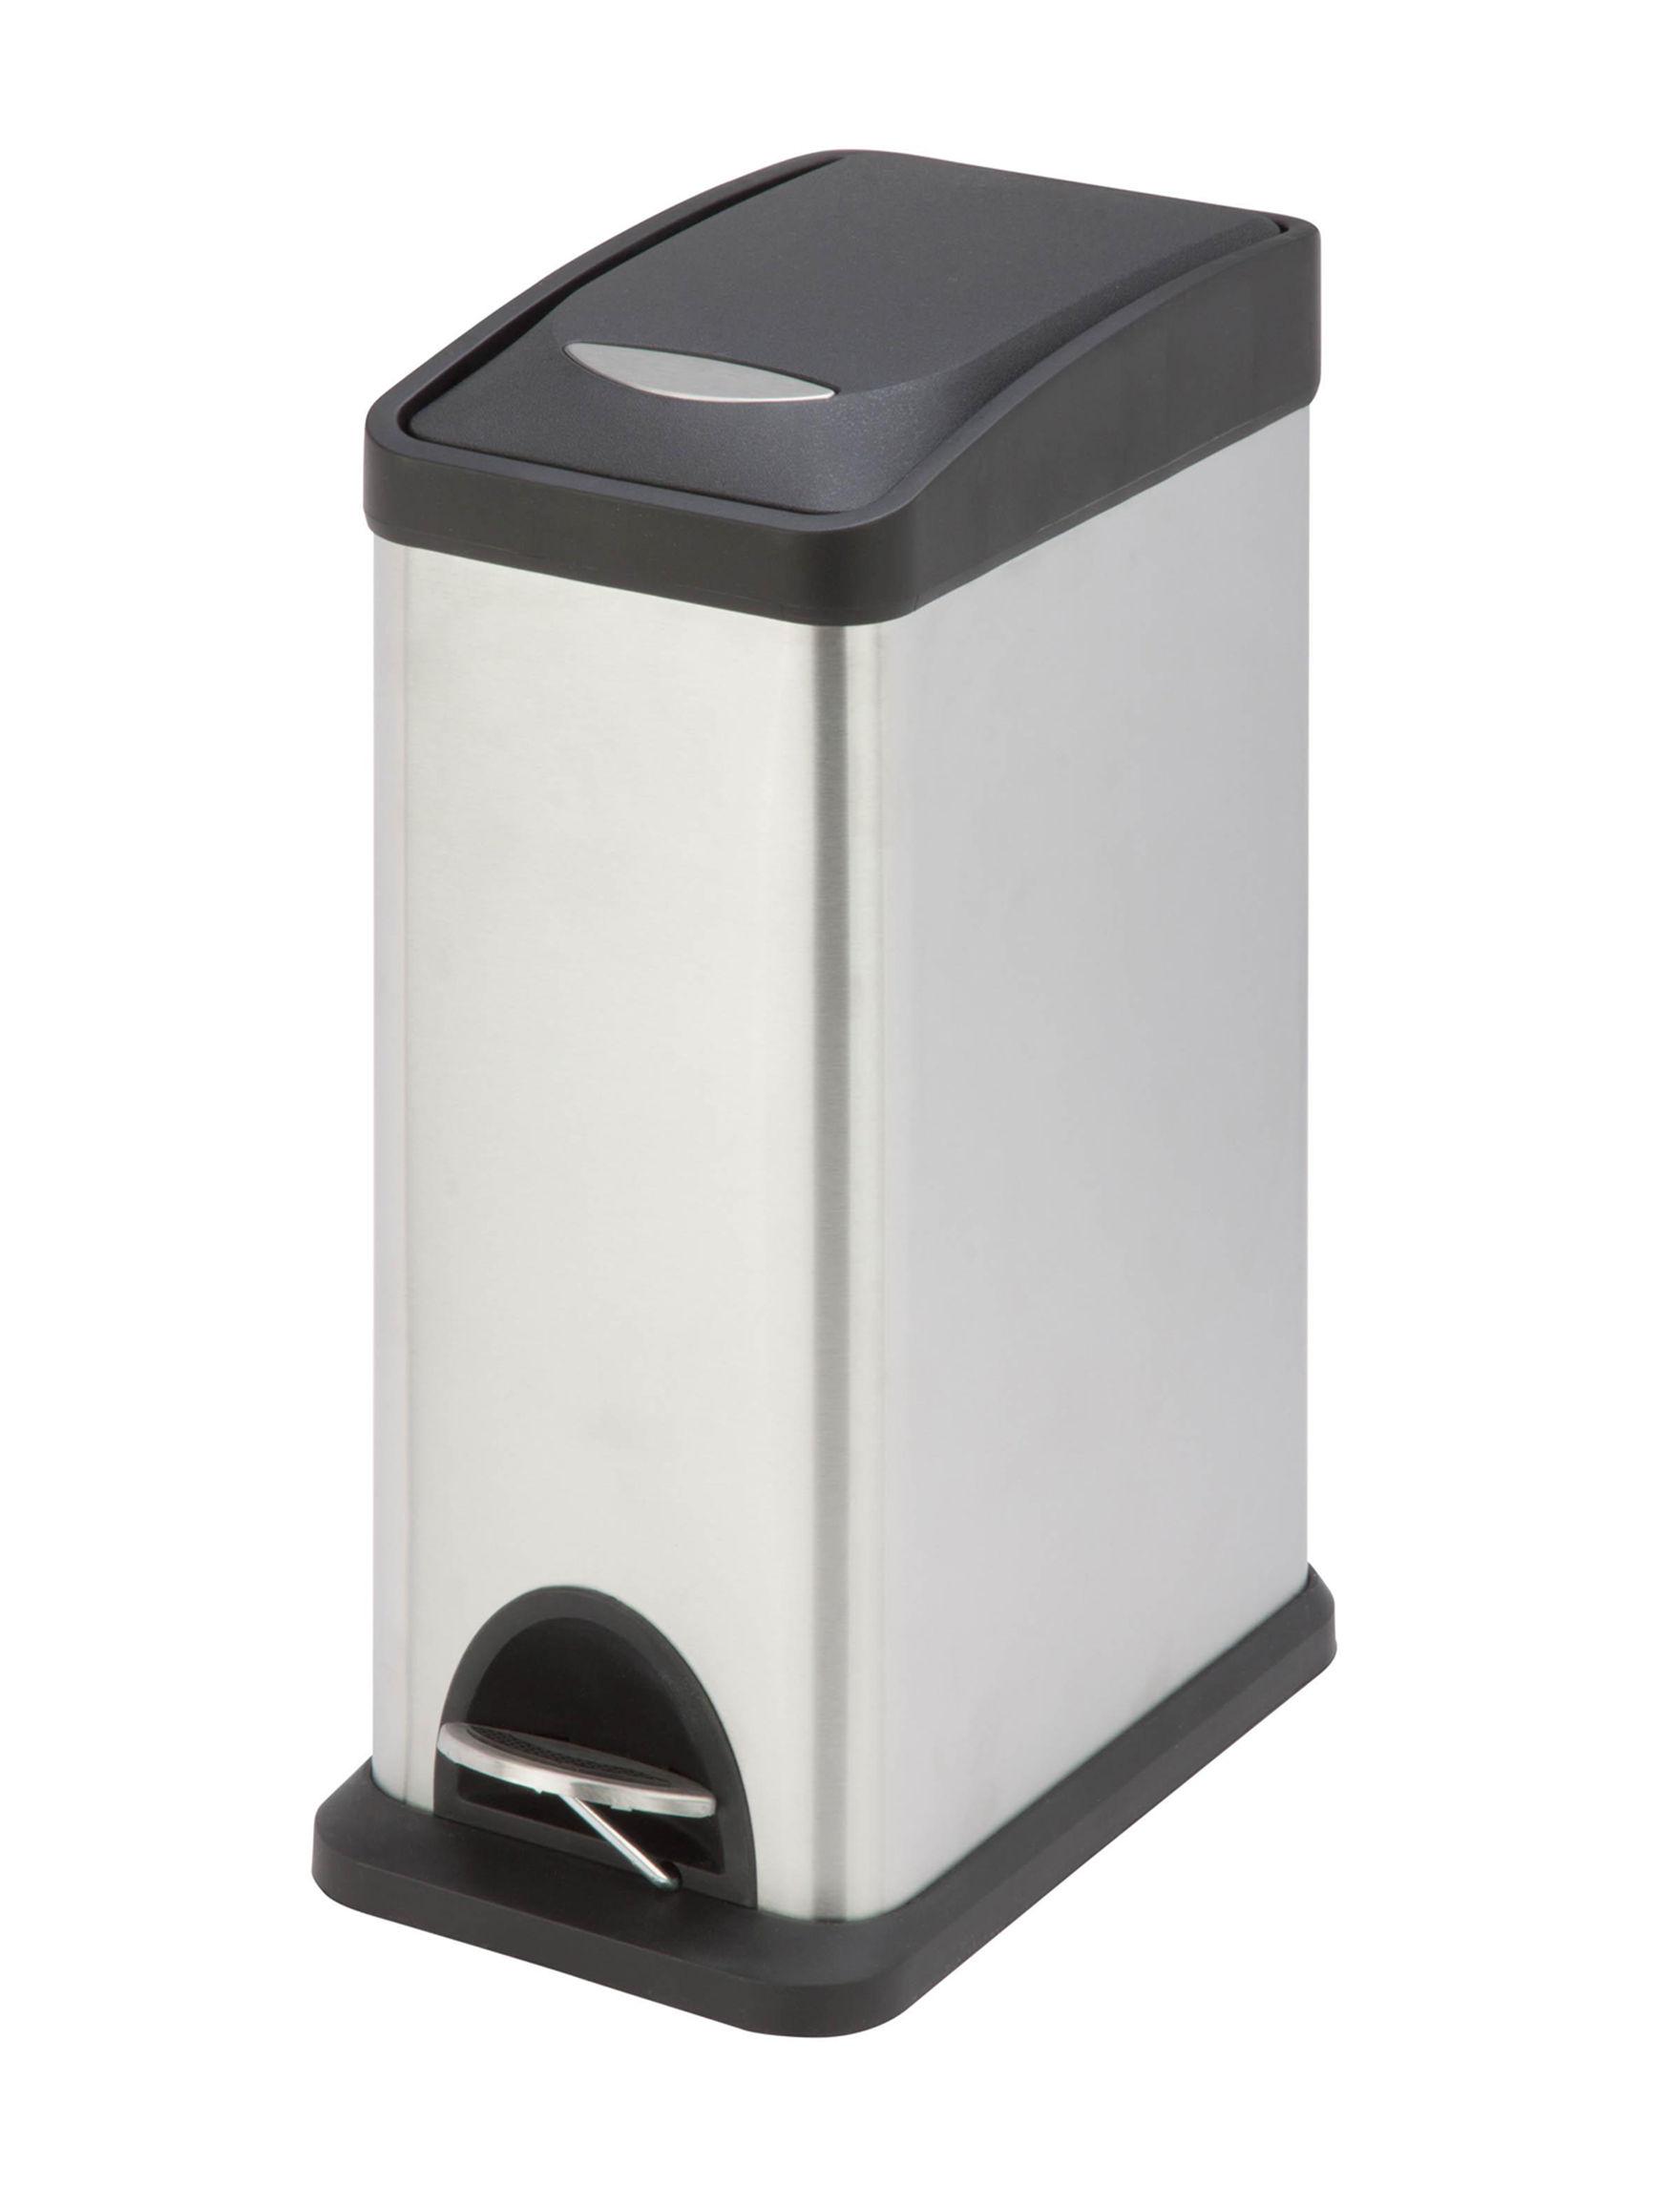 Honey-Can-Do International Grey Trash & Recycling Bins Storage & Organization